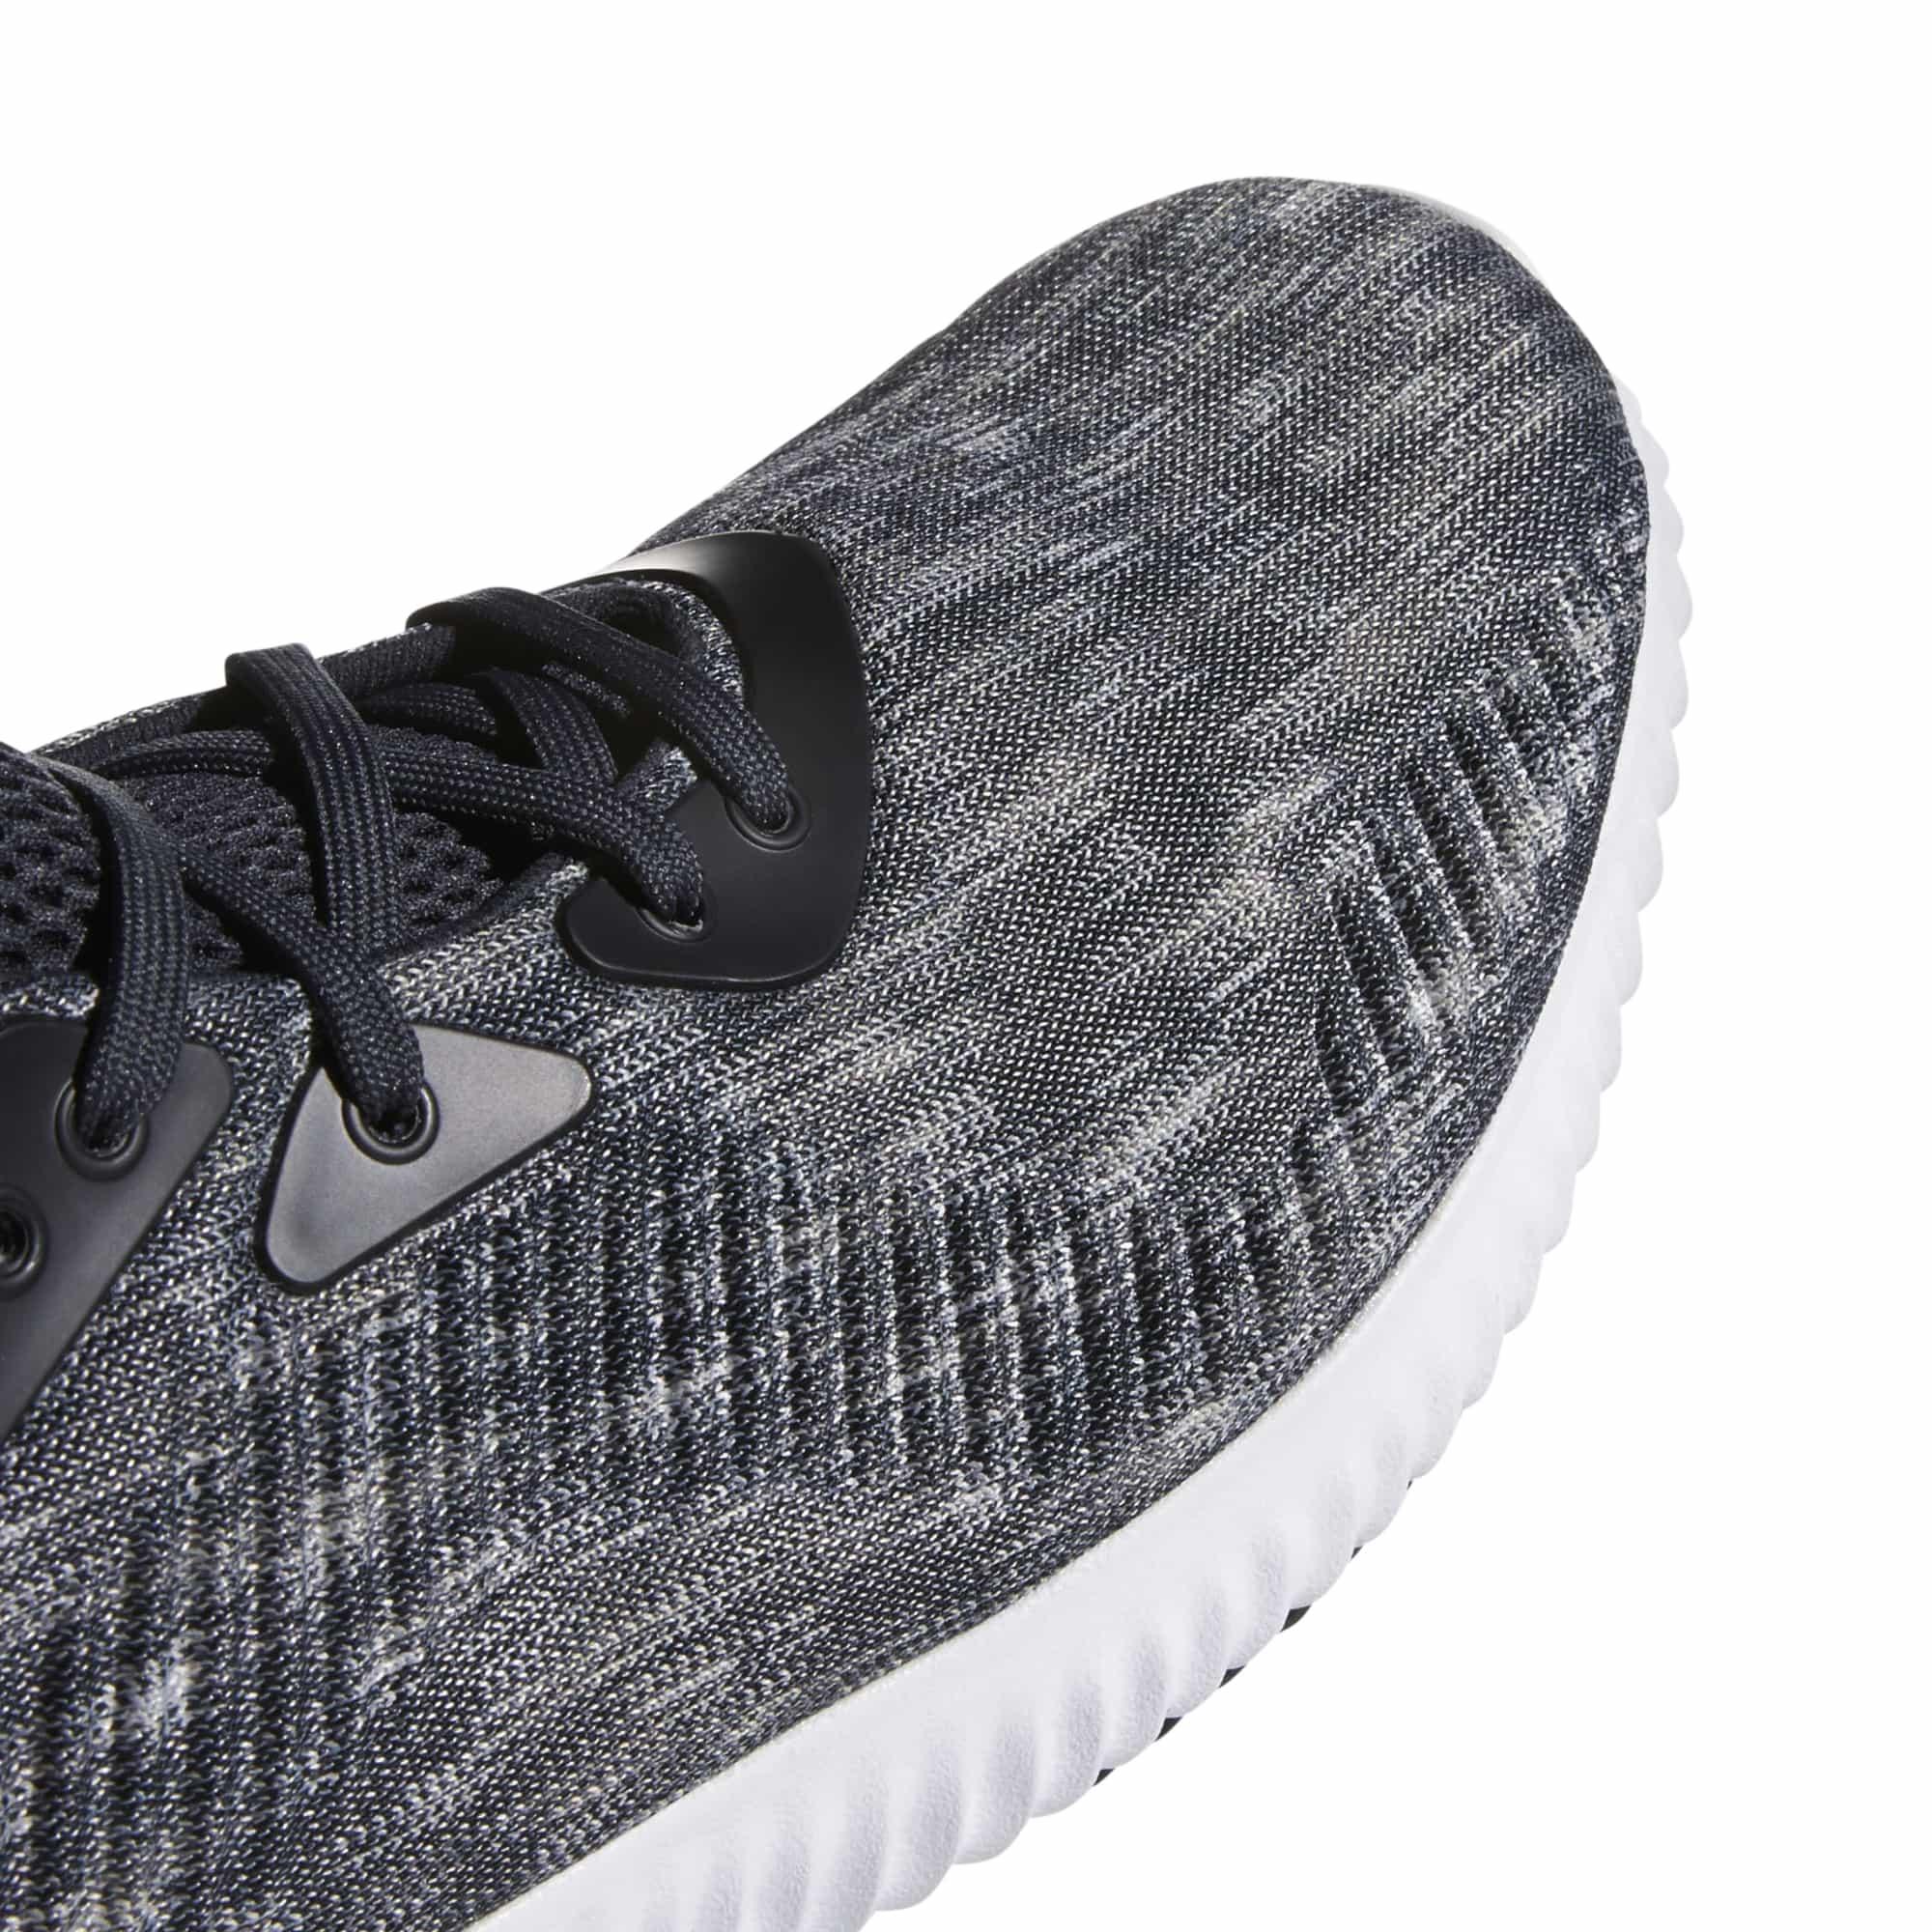 2018 Adidas Alphabounce rabat salg